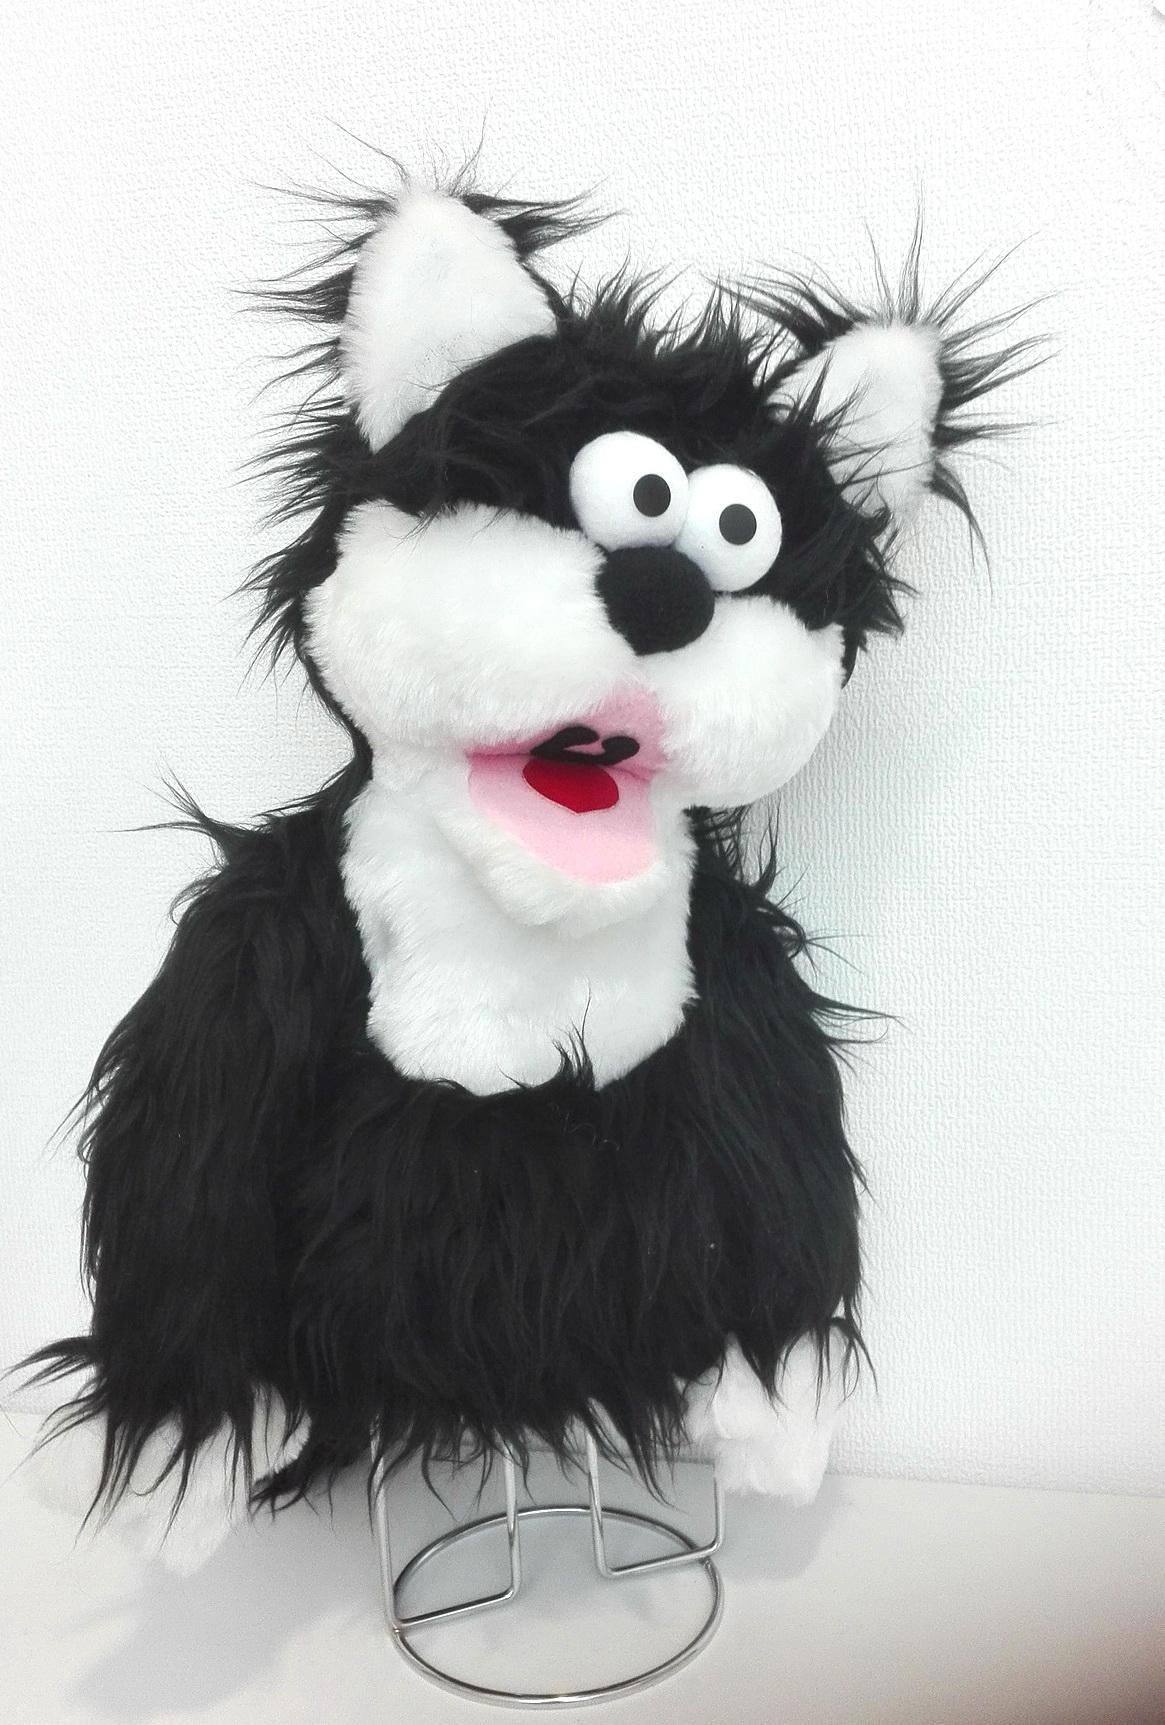 кукла с открывающимся ртом кот мохнатый